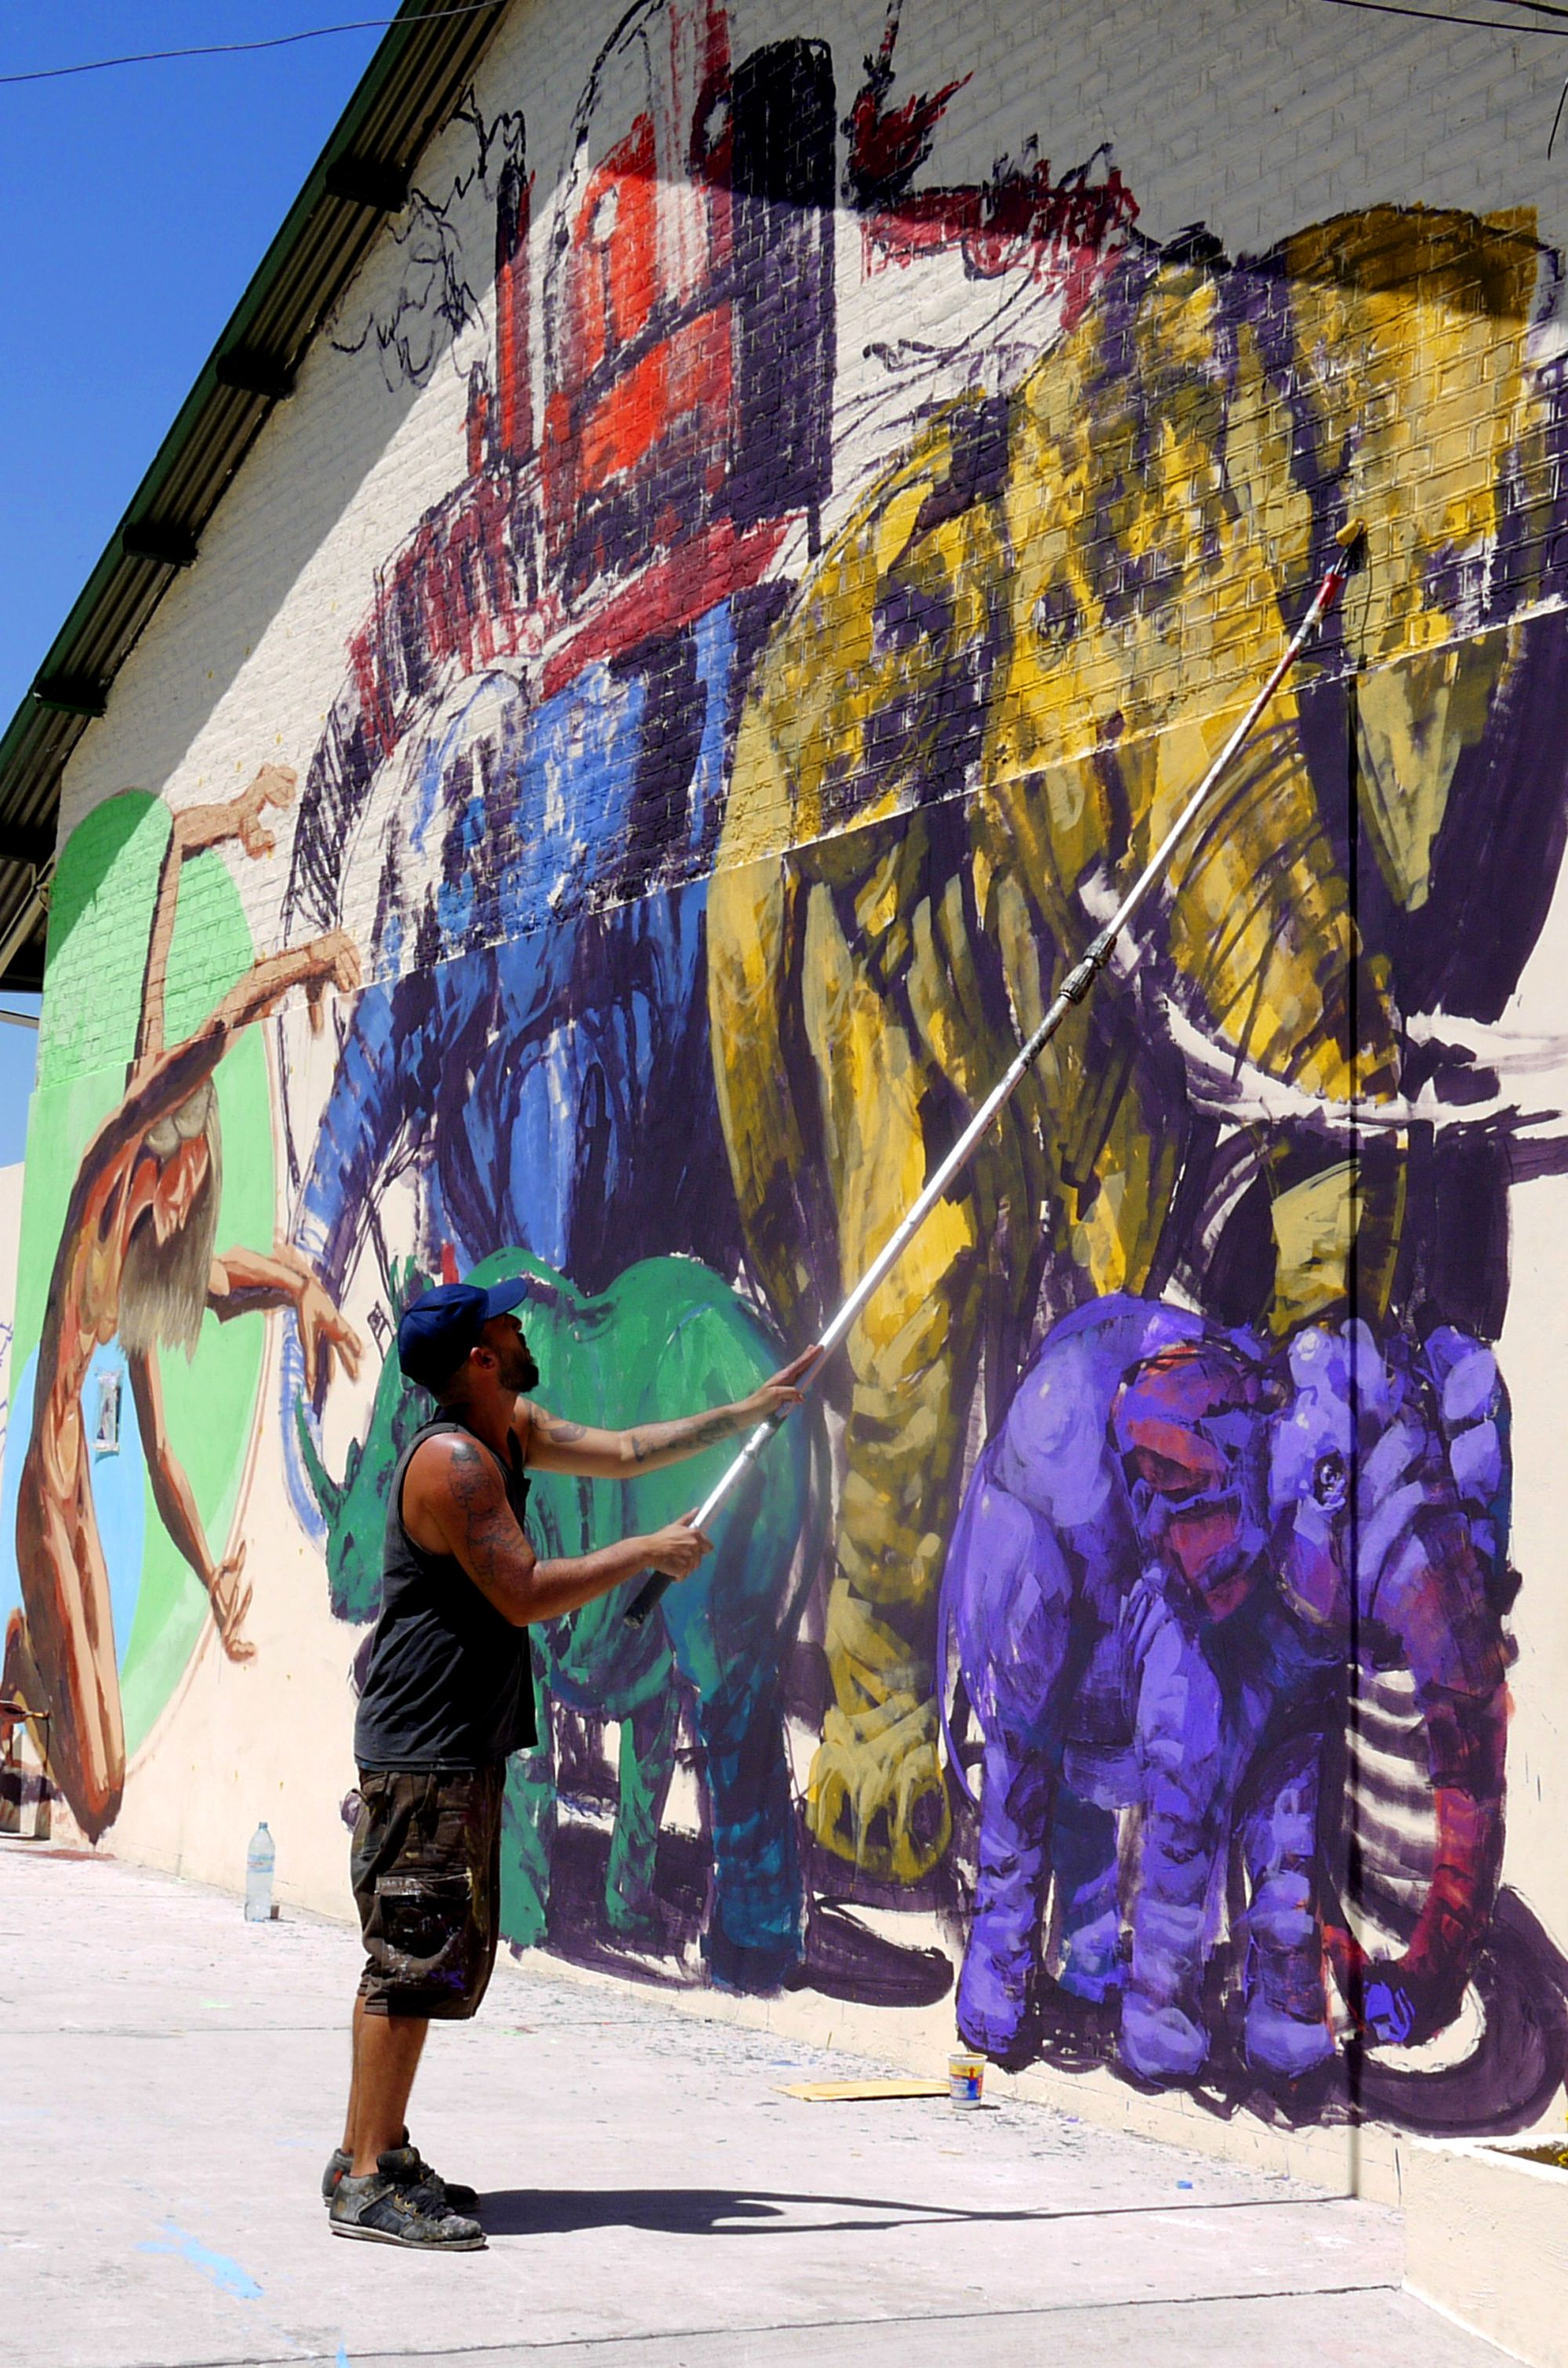 street art in process elephants street art pinterest street art street and graffiti. Black Bedroom Furniture Sets. Home Design Ideas